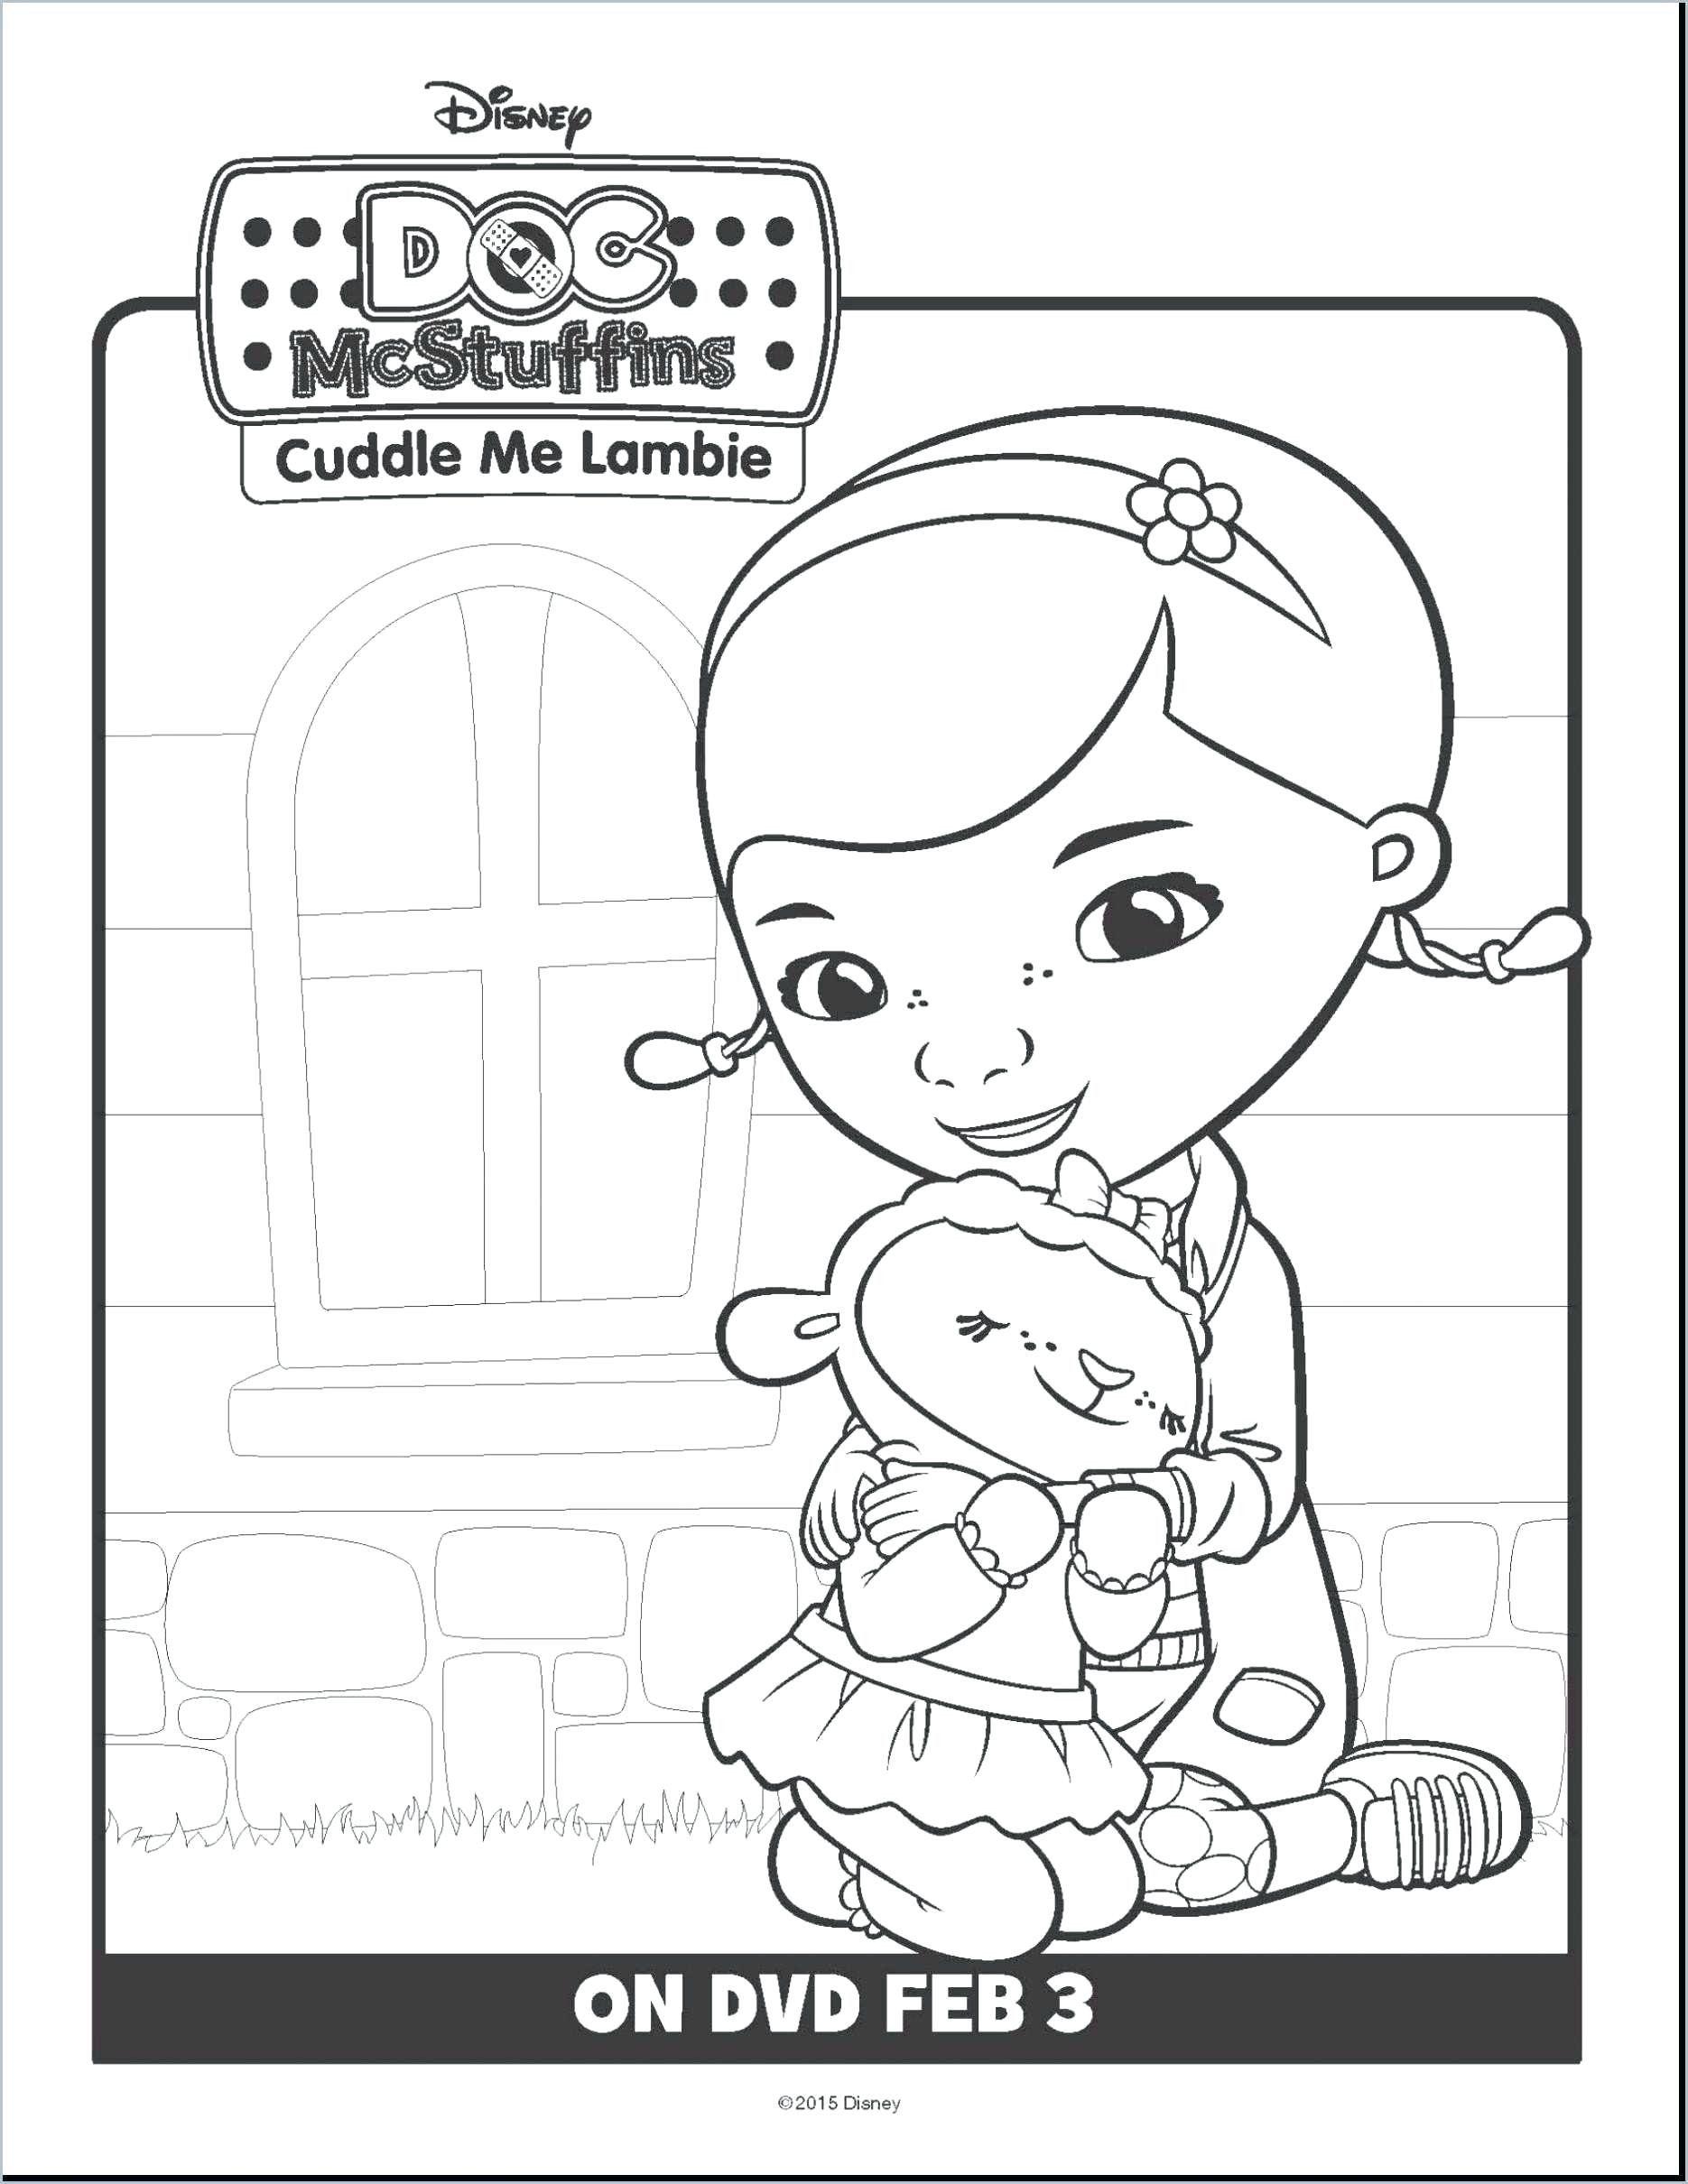 Chuck E Cheese Coloring Page New Chuck E Cheese Coloring Pages Mayhemcolor Coloring Pages Kids Printable Coloring Pages Doc Mcstuffins Coloring Pages